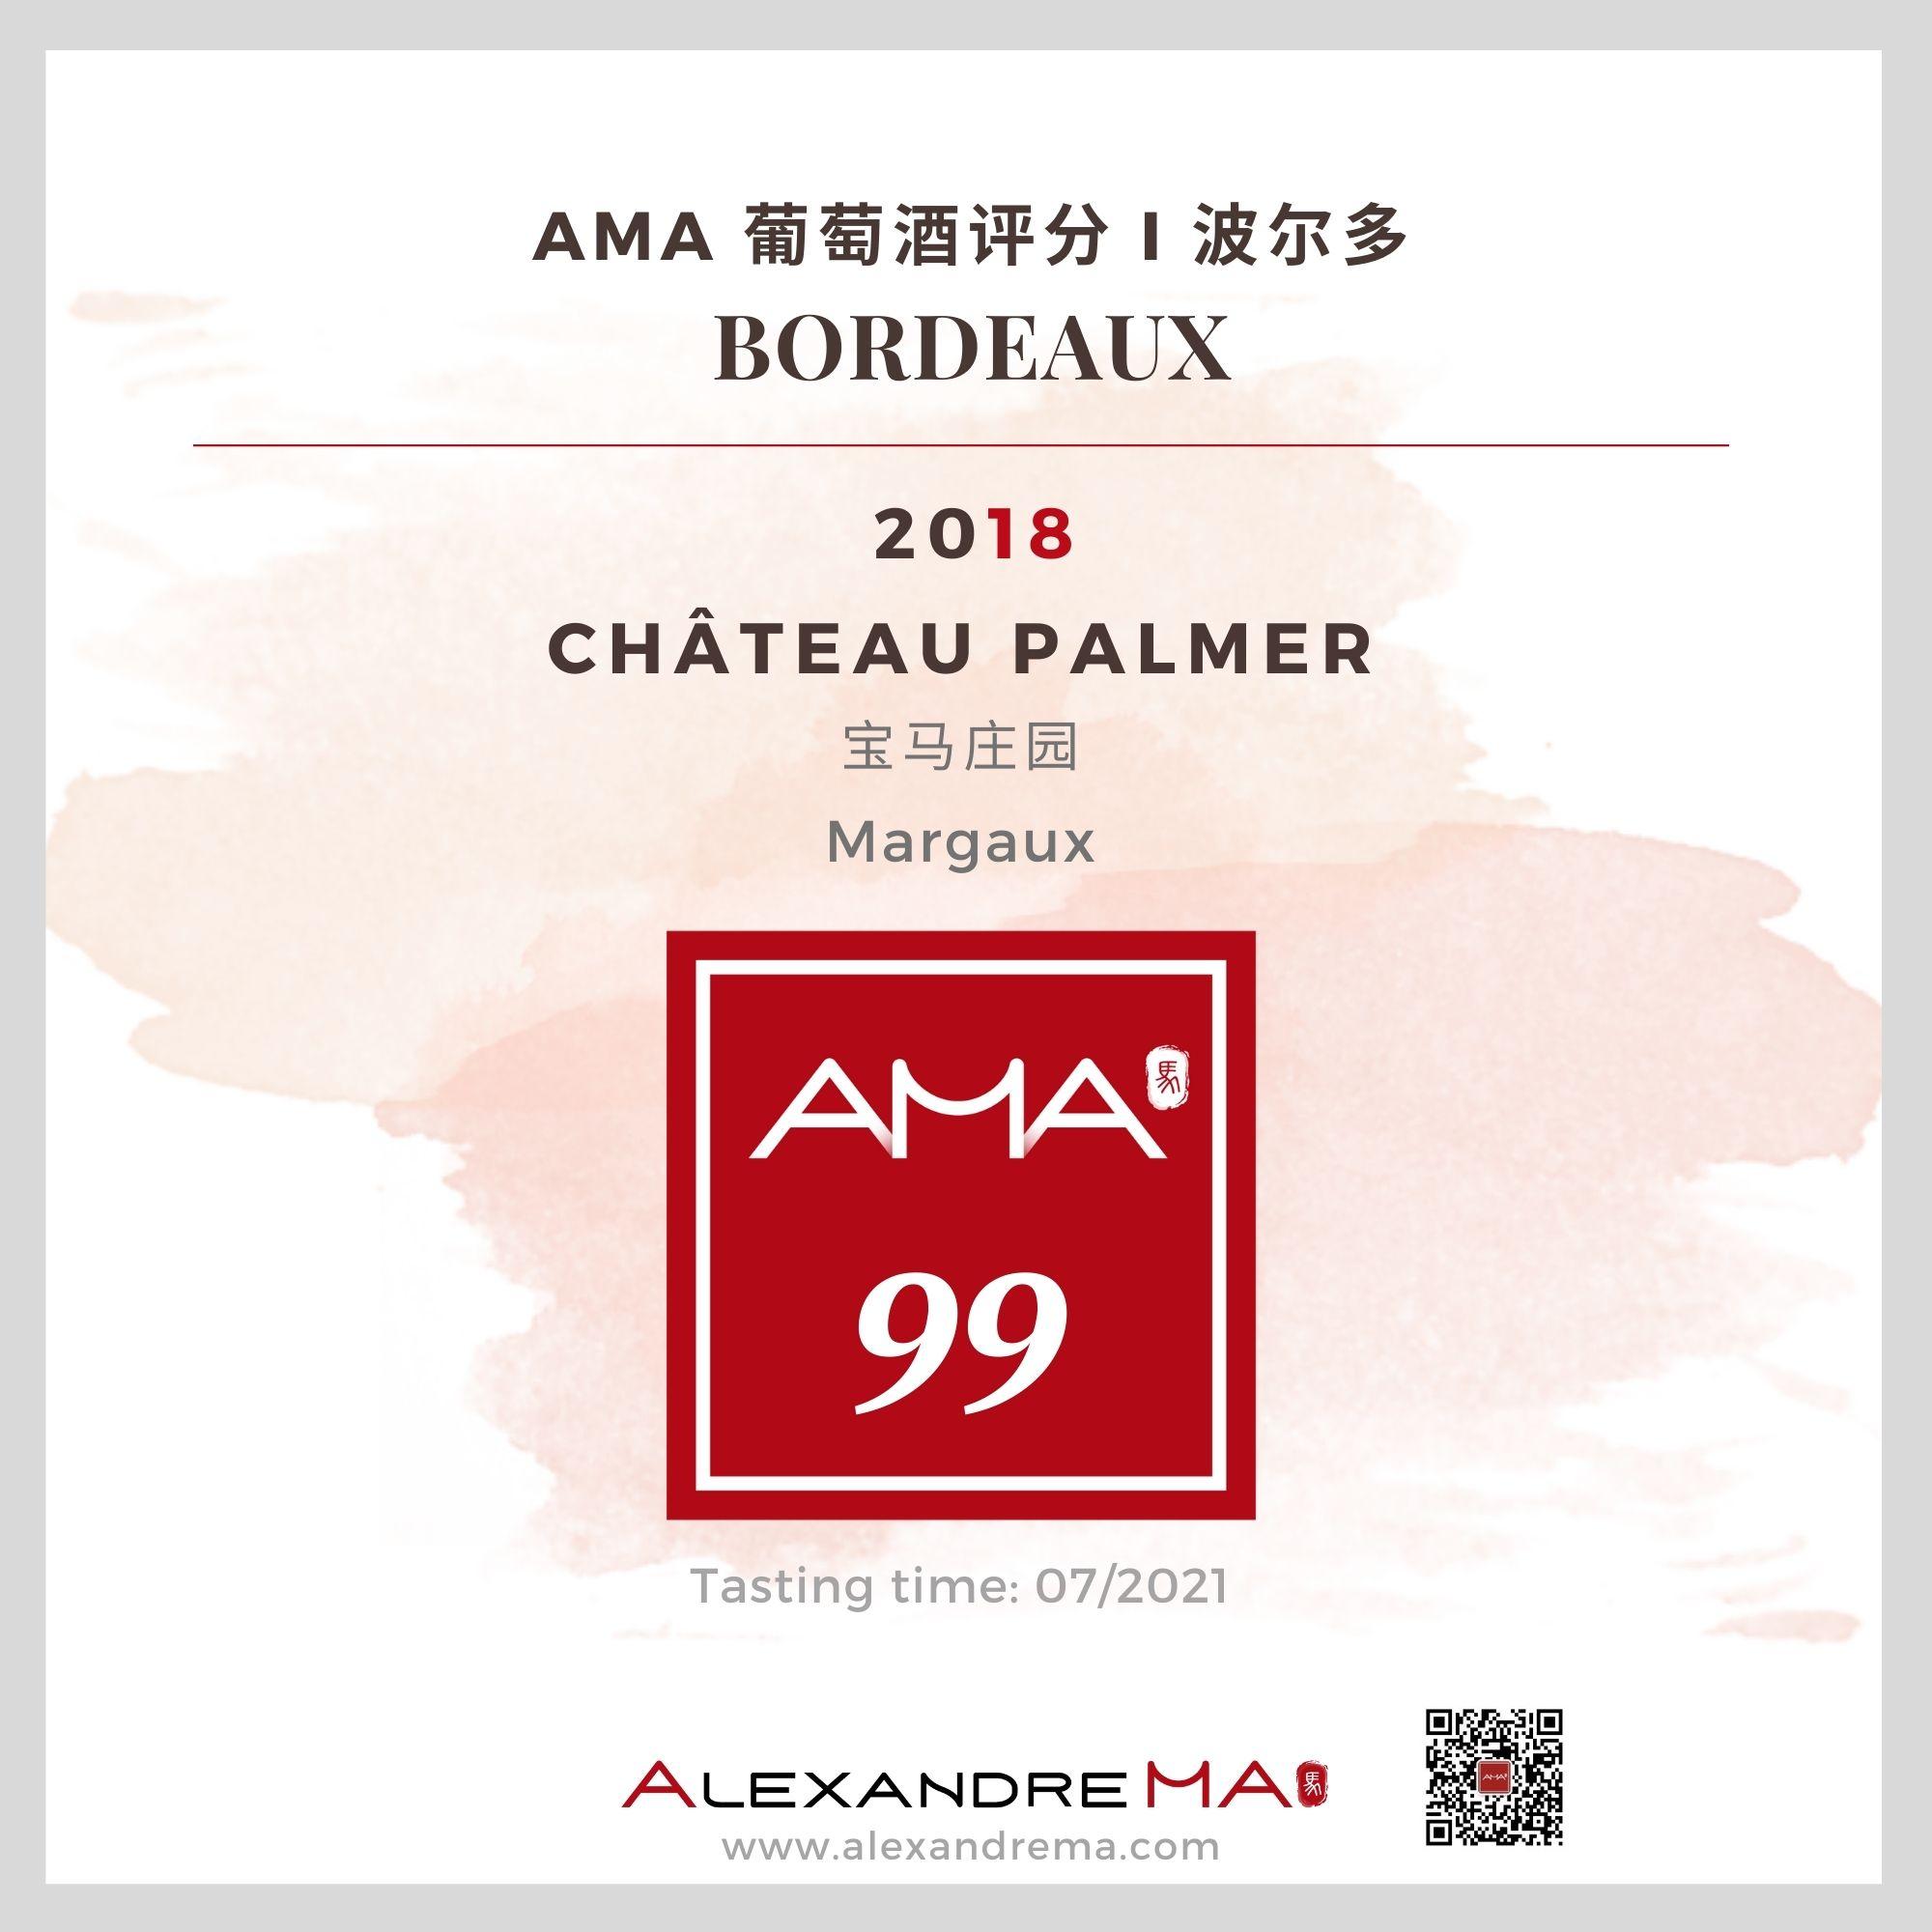 Château Palmer 2018 宝马庄园 - Alexandre Ma